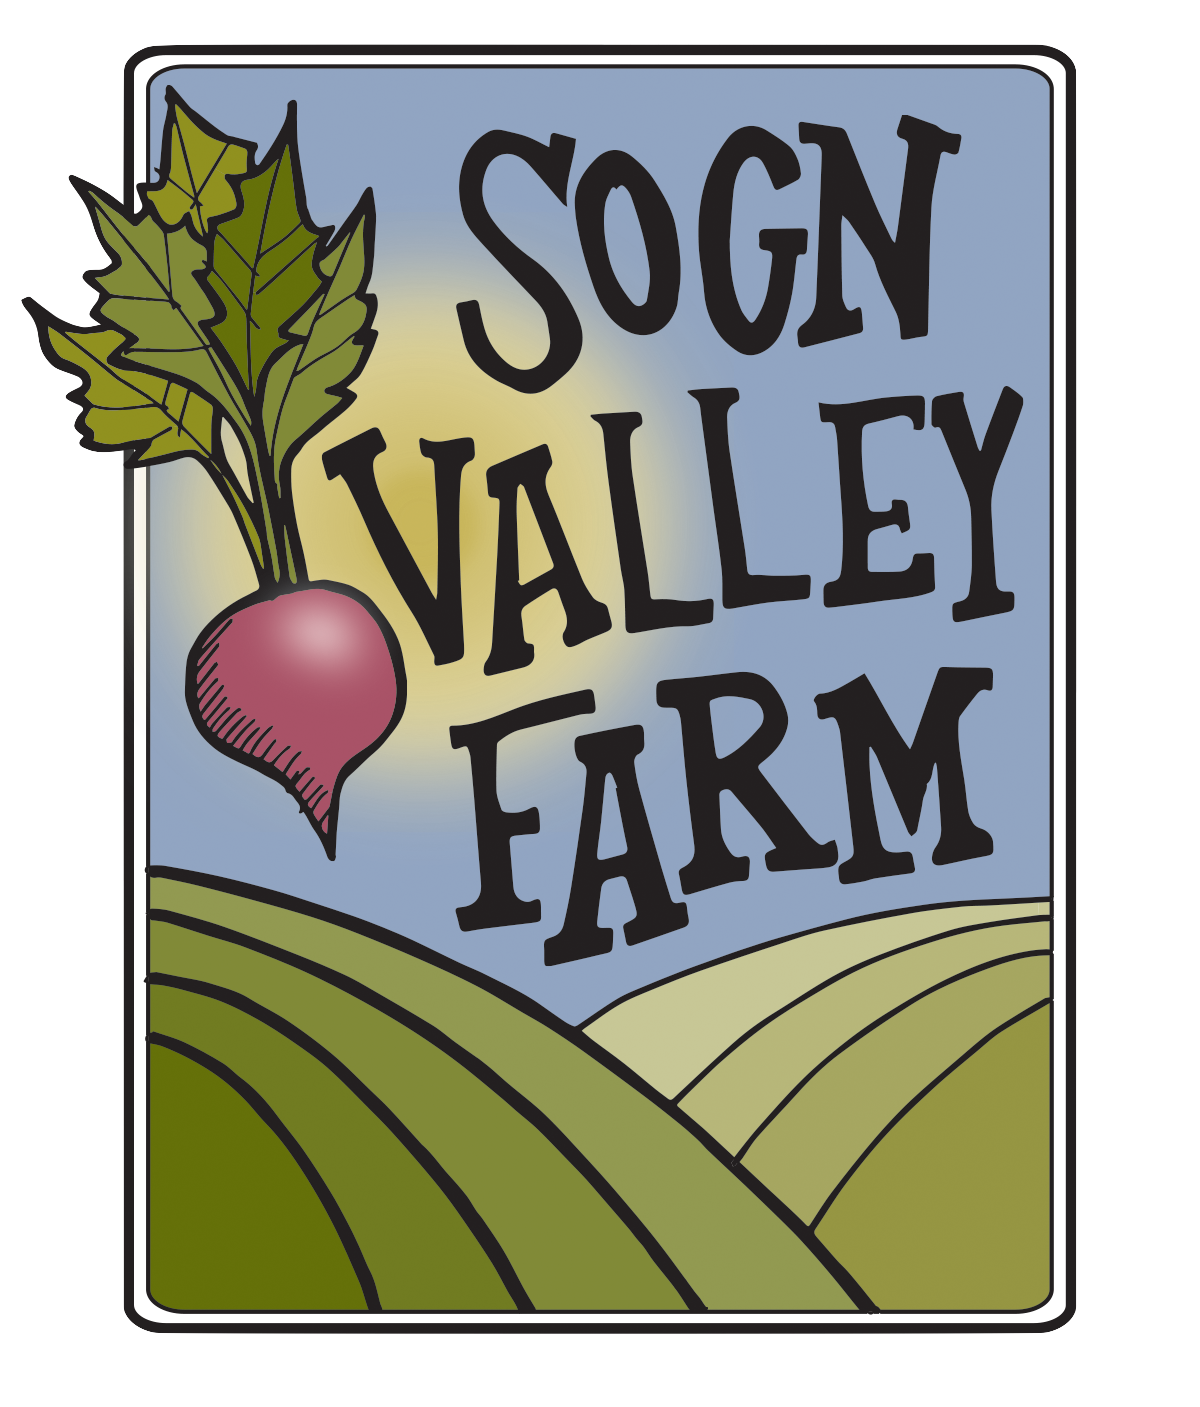 Sogn valley farm csa. Gardener clipart organic farming